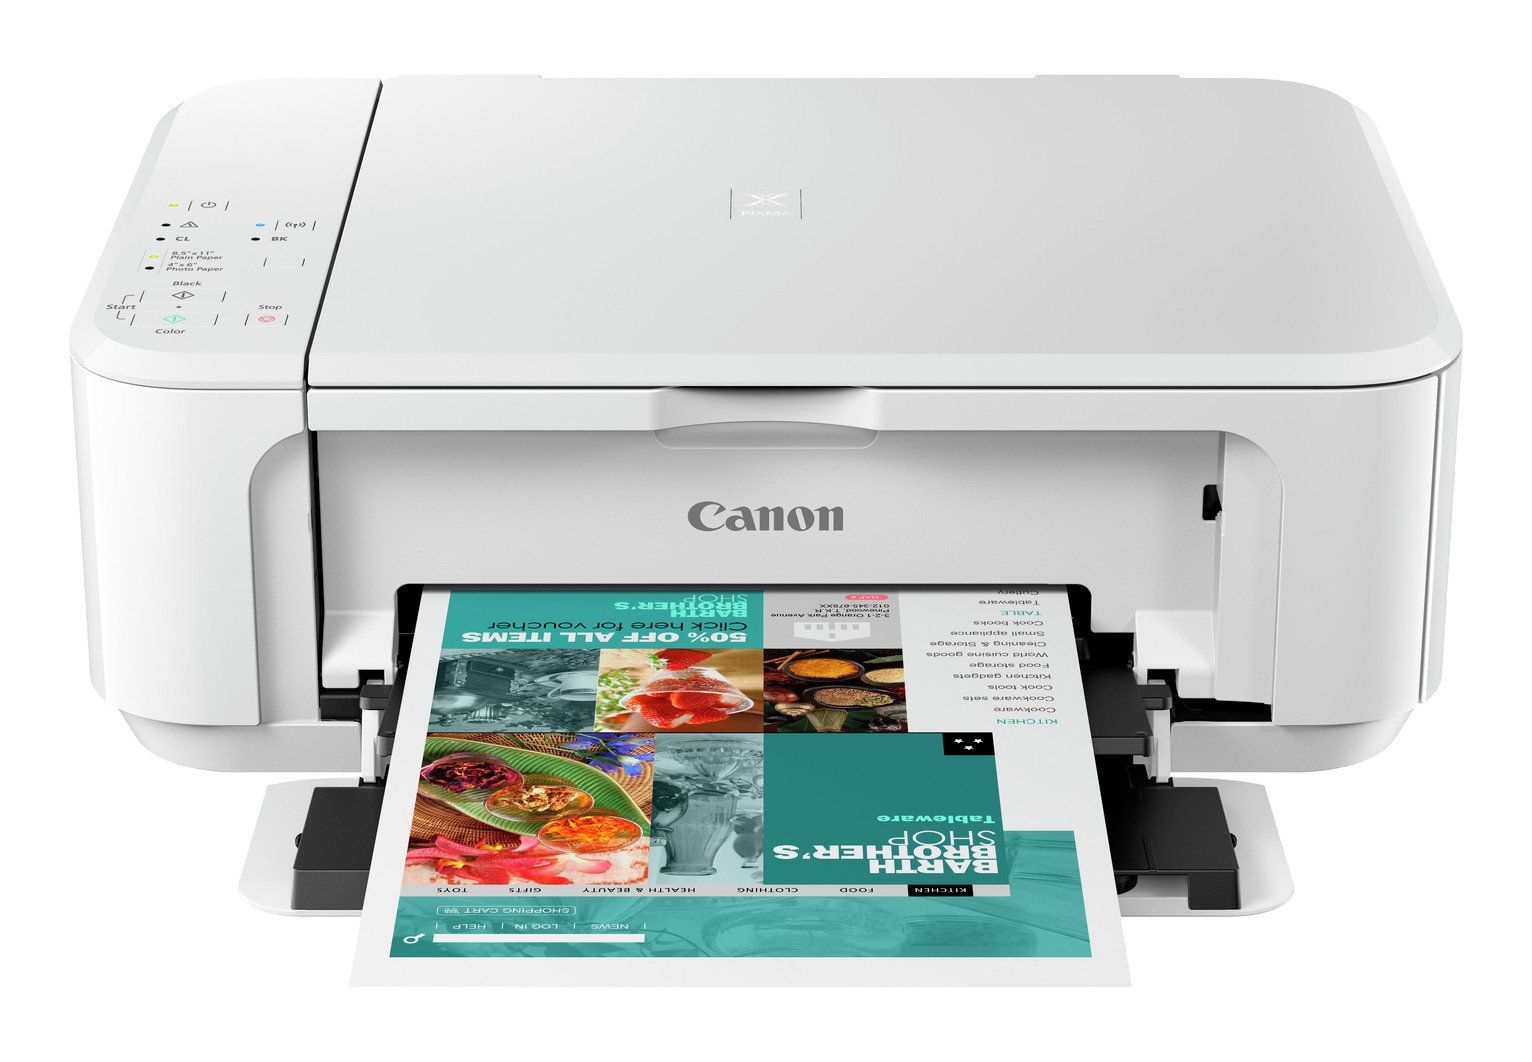 Canon Pixma MG3650S Wireless Inkjet Printer - White